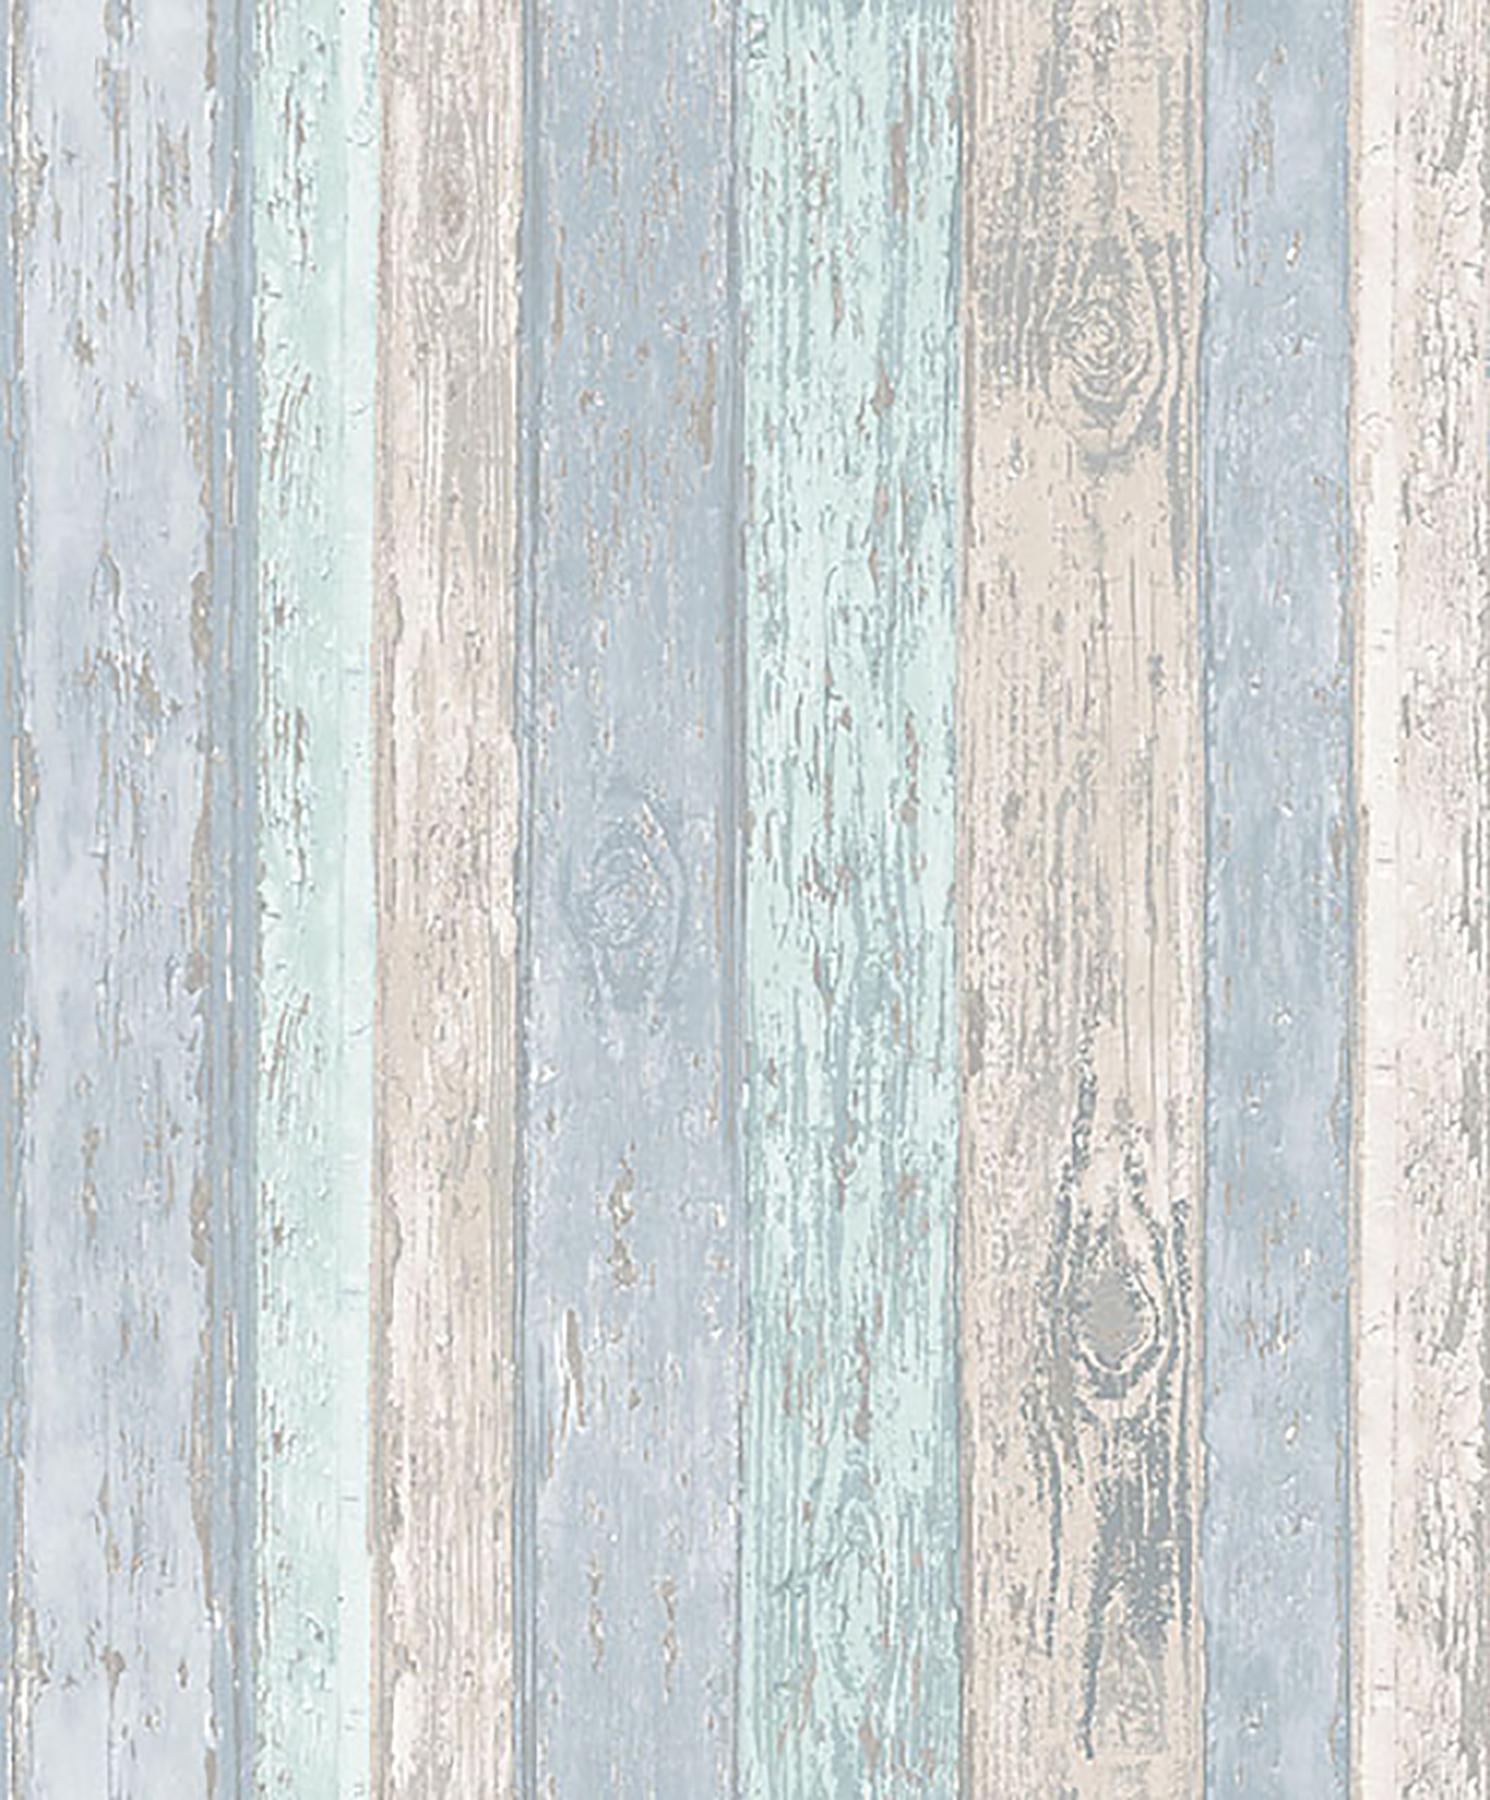 Wood Effect Wall Paper Blue - HD Wallpaper